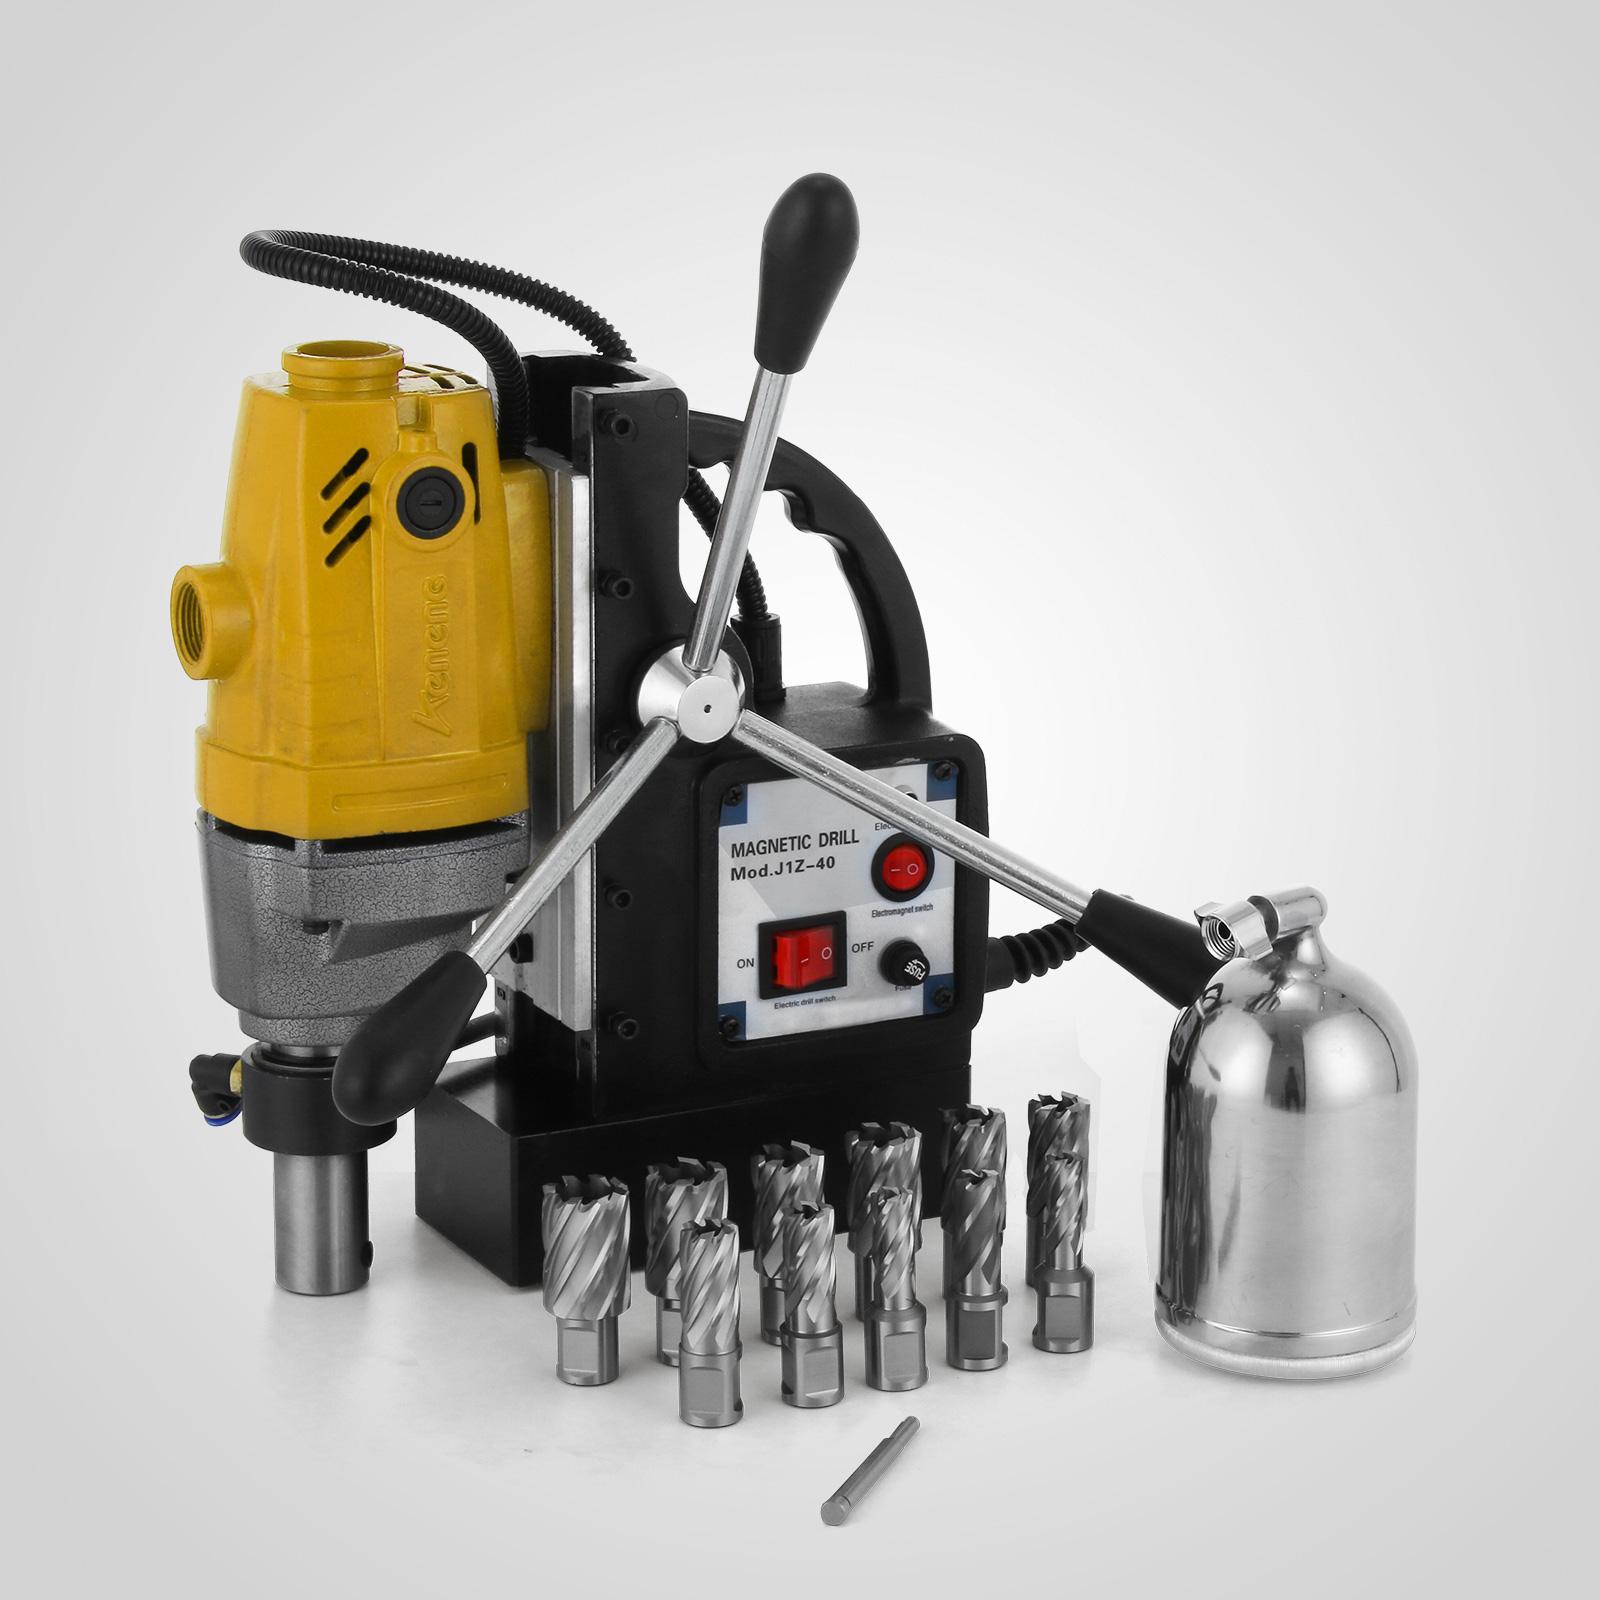 MB23-BRM35-MD40-Trapano-Perforatrice-Carotatore-Fresa-Magnetico-12-40mm-230V miniatura 40